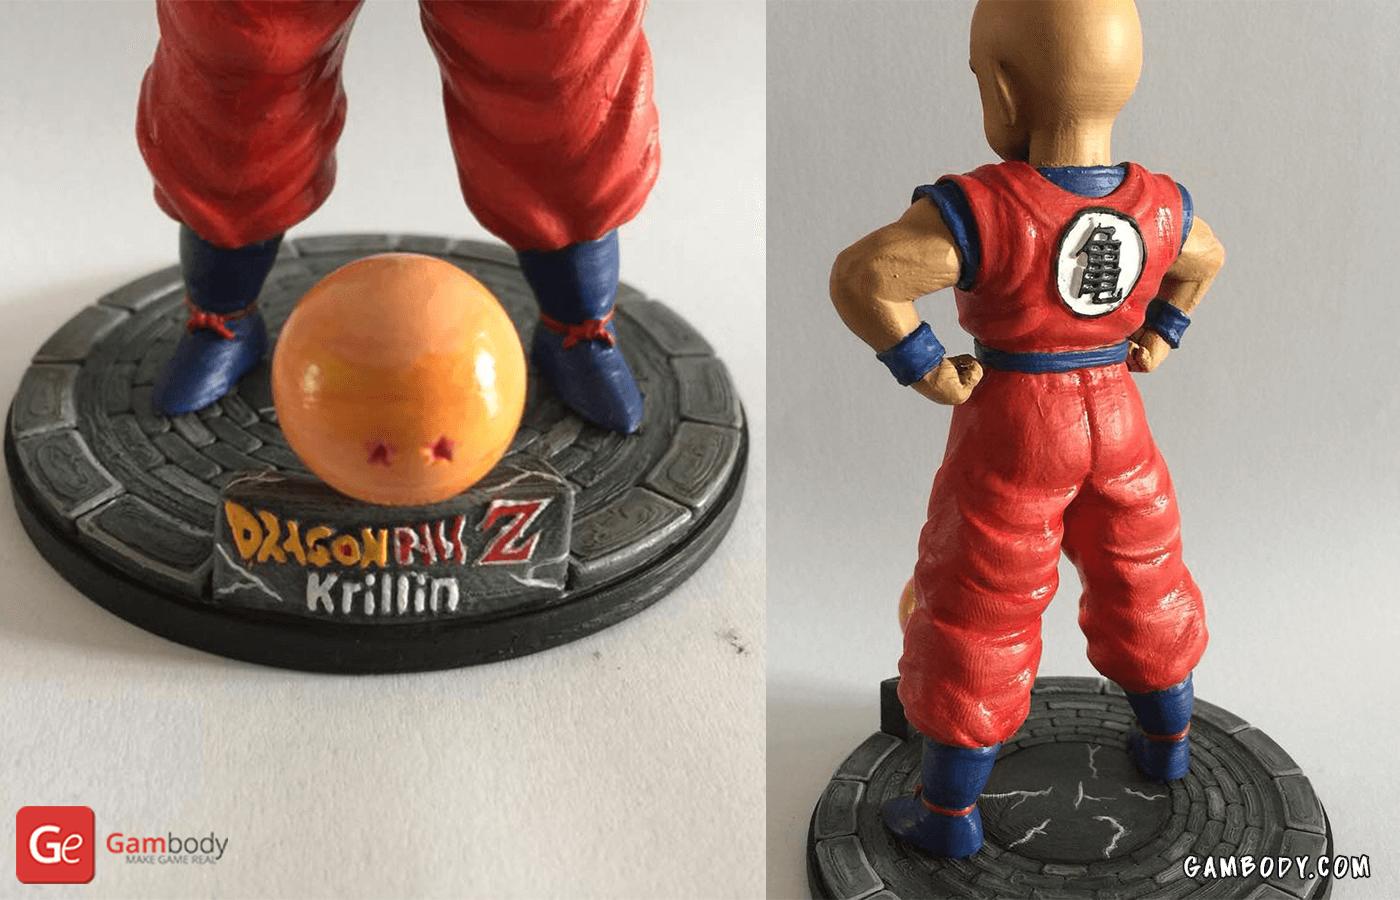 Krillin 3D Printing Figure Photo 2